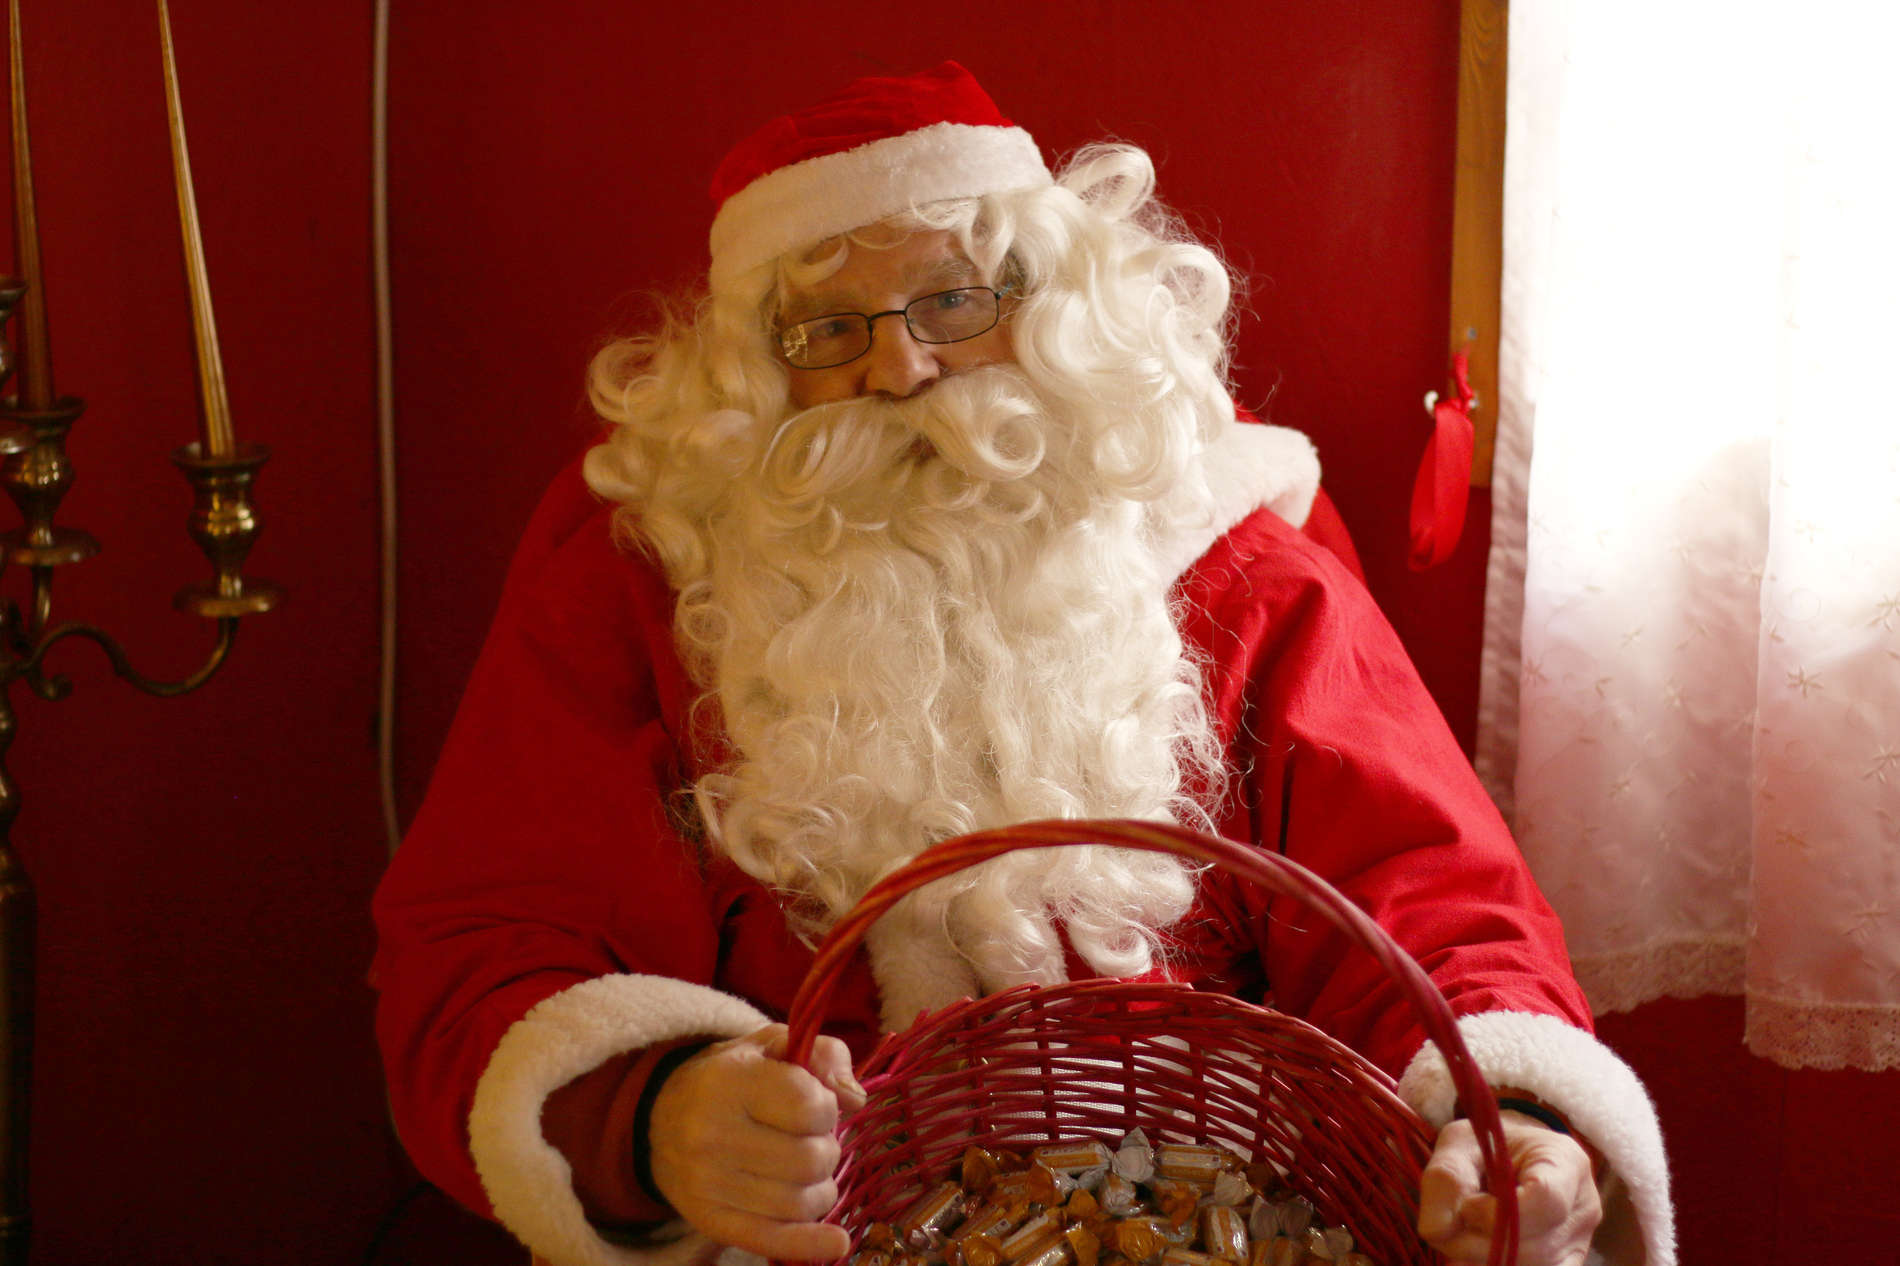 Santa Claus at the Christmas Market of Tallinn, Estonia. Photo by: Kadi-Liis Koppel